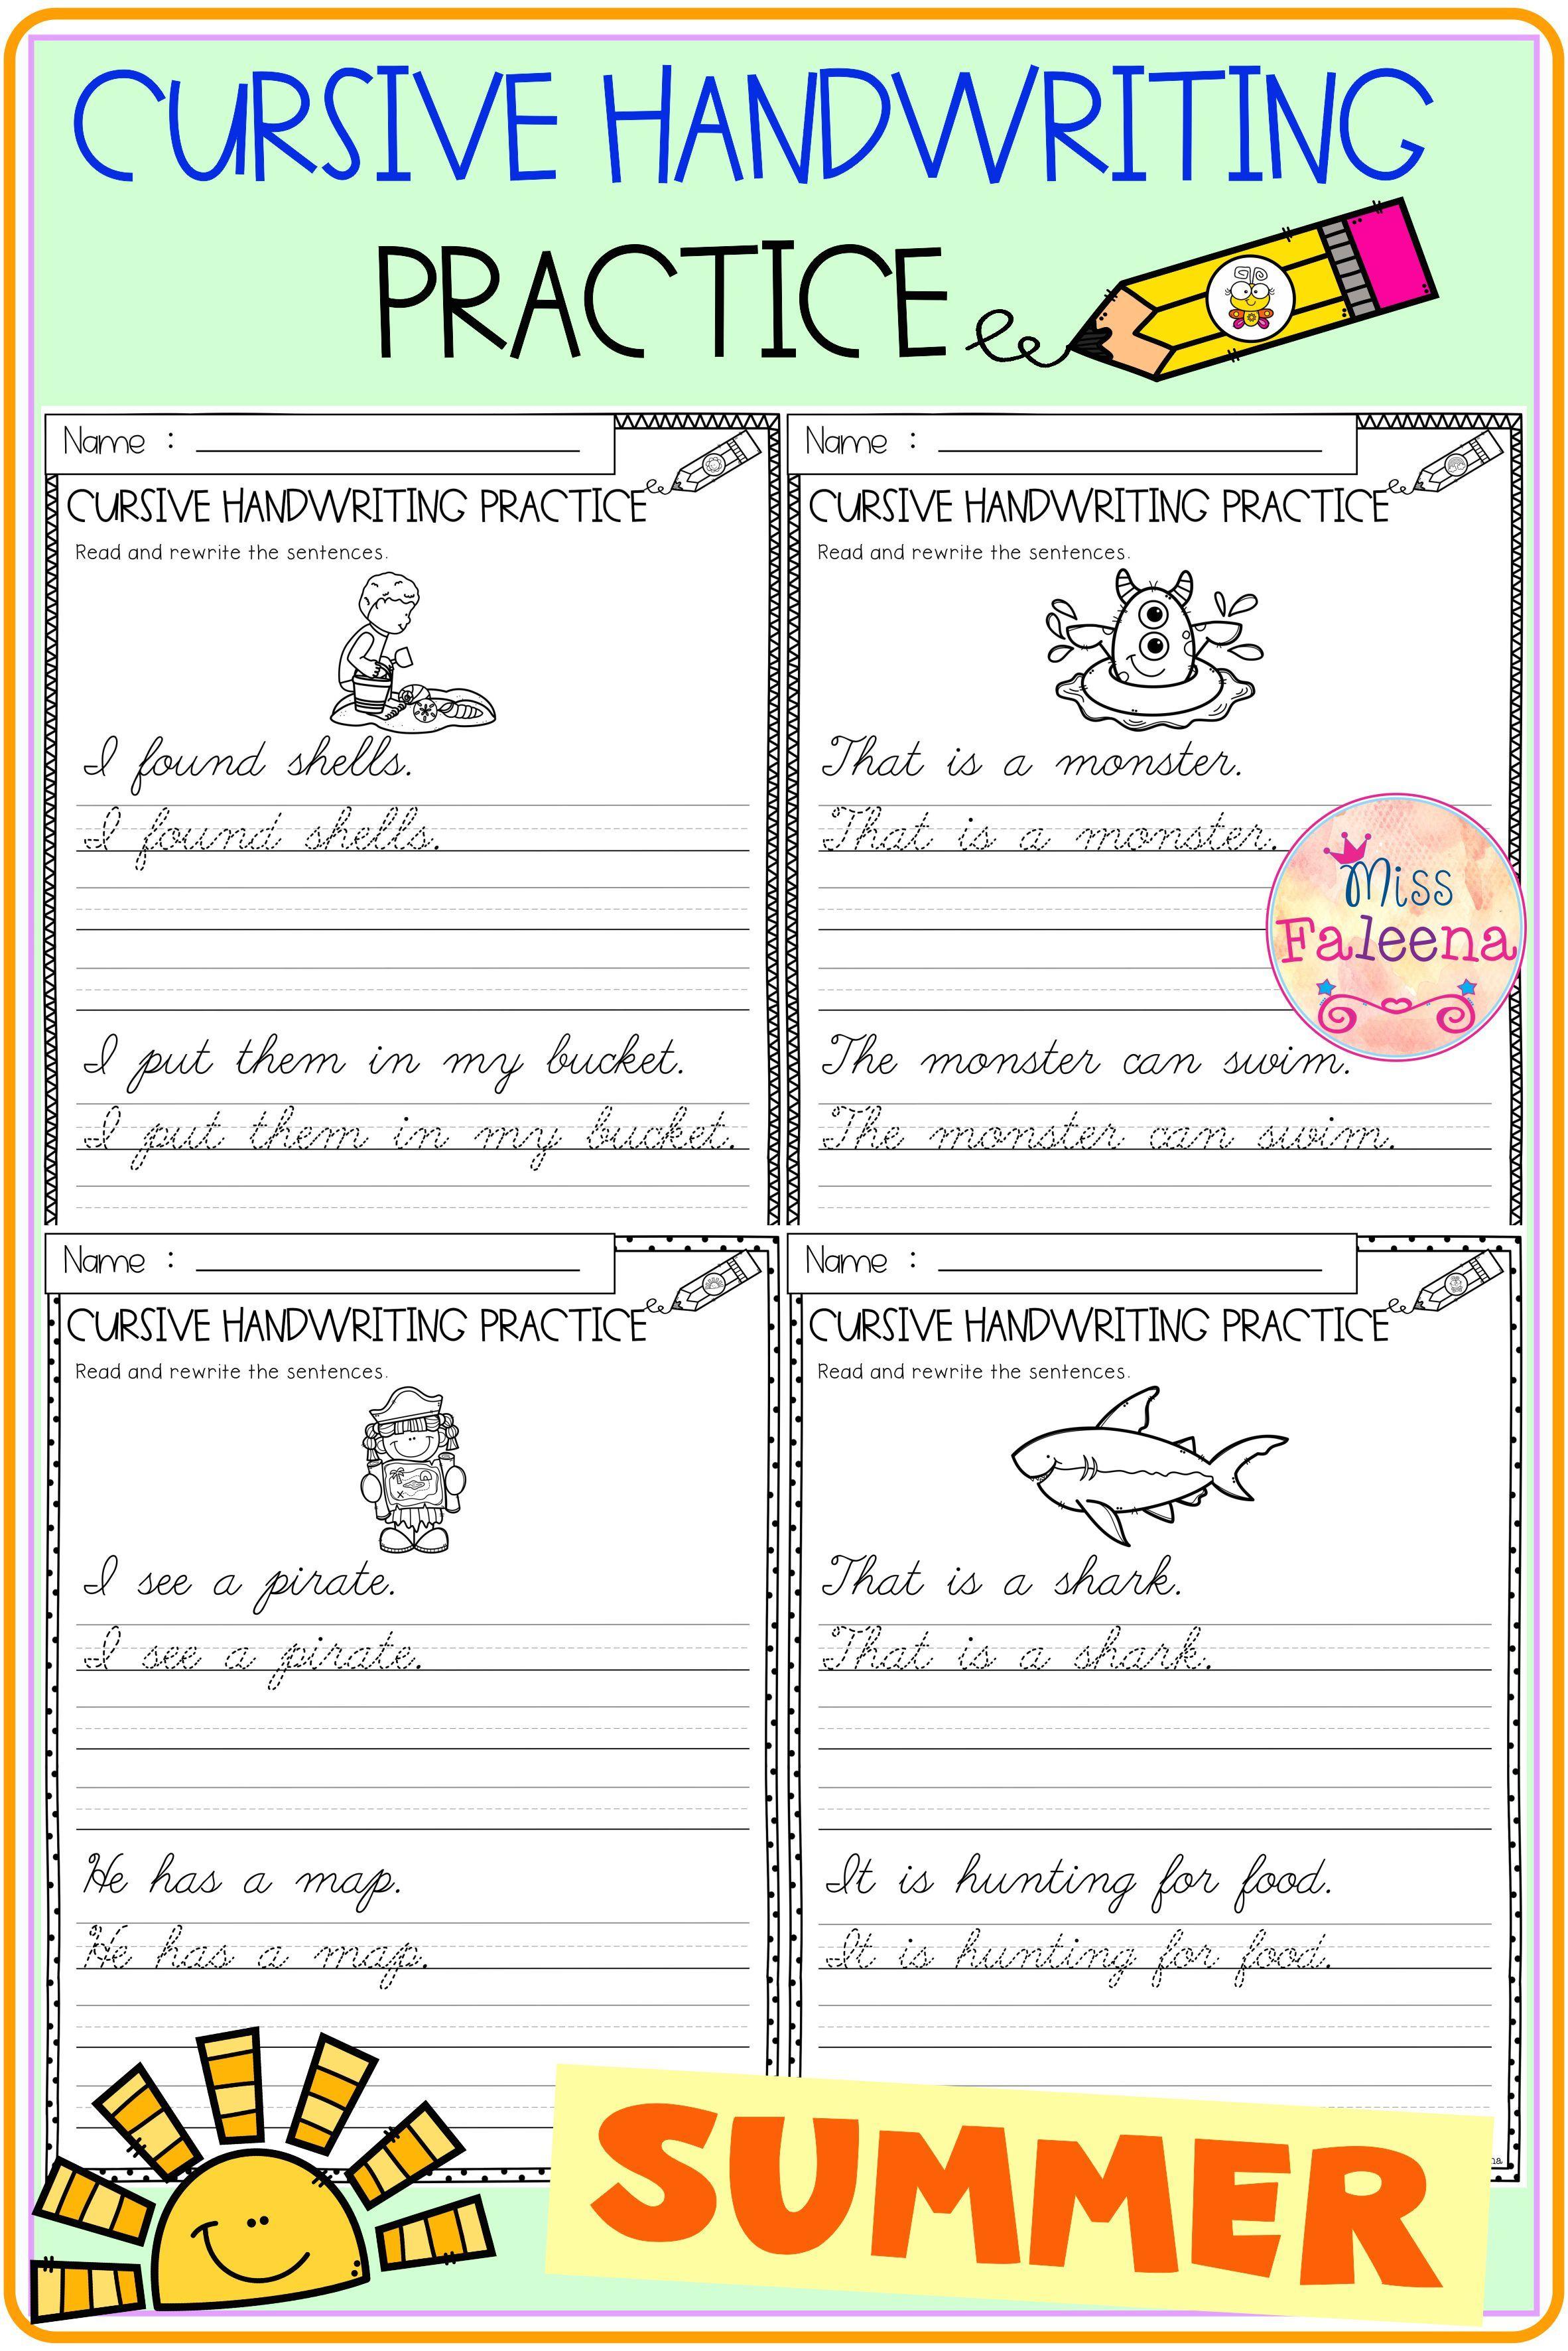 Summer Cursive Handwriting Practice Cursive Handwriting Practice Handwriting Practice Cursive Practice [ 3544 x 2364 Pixel ]